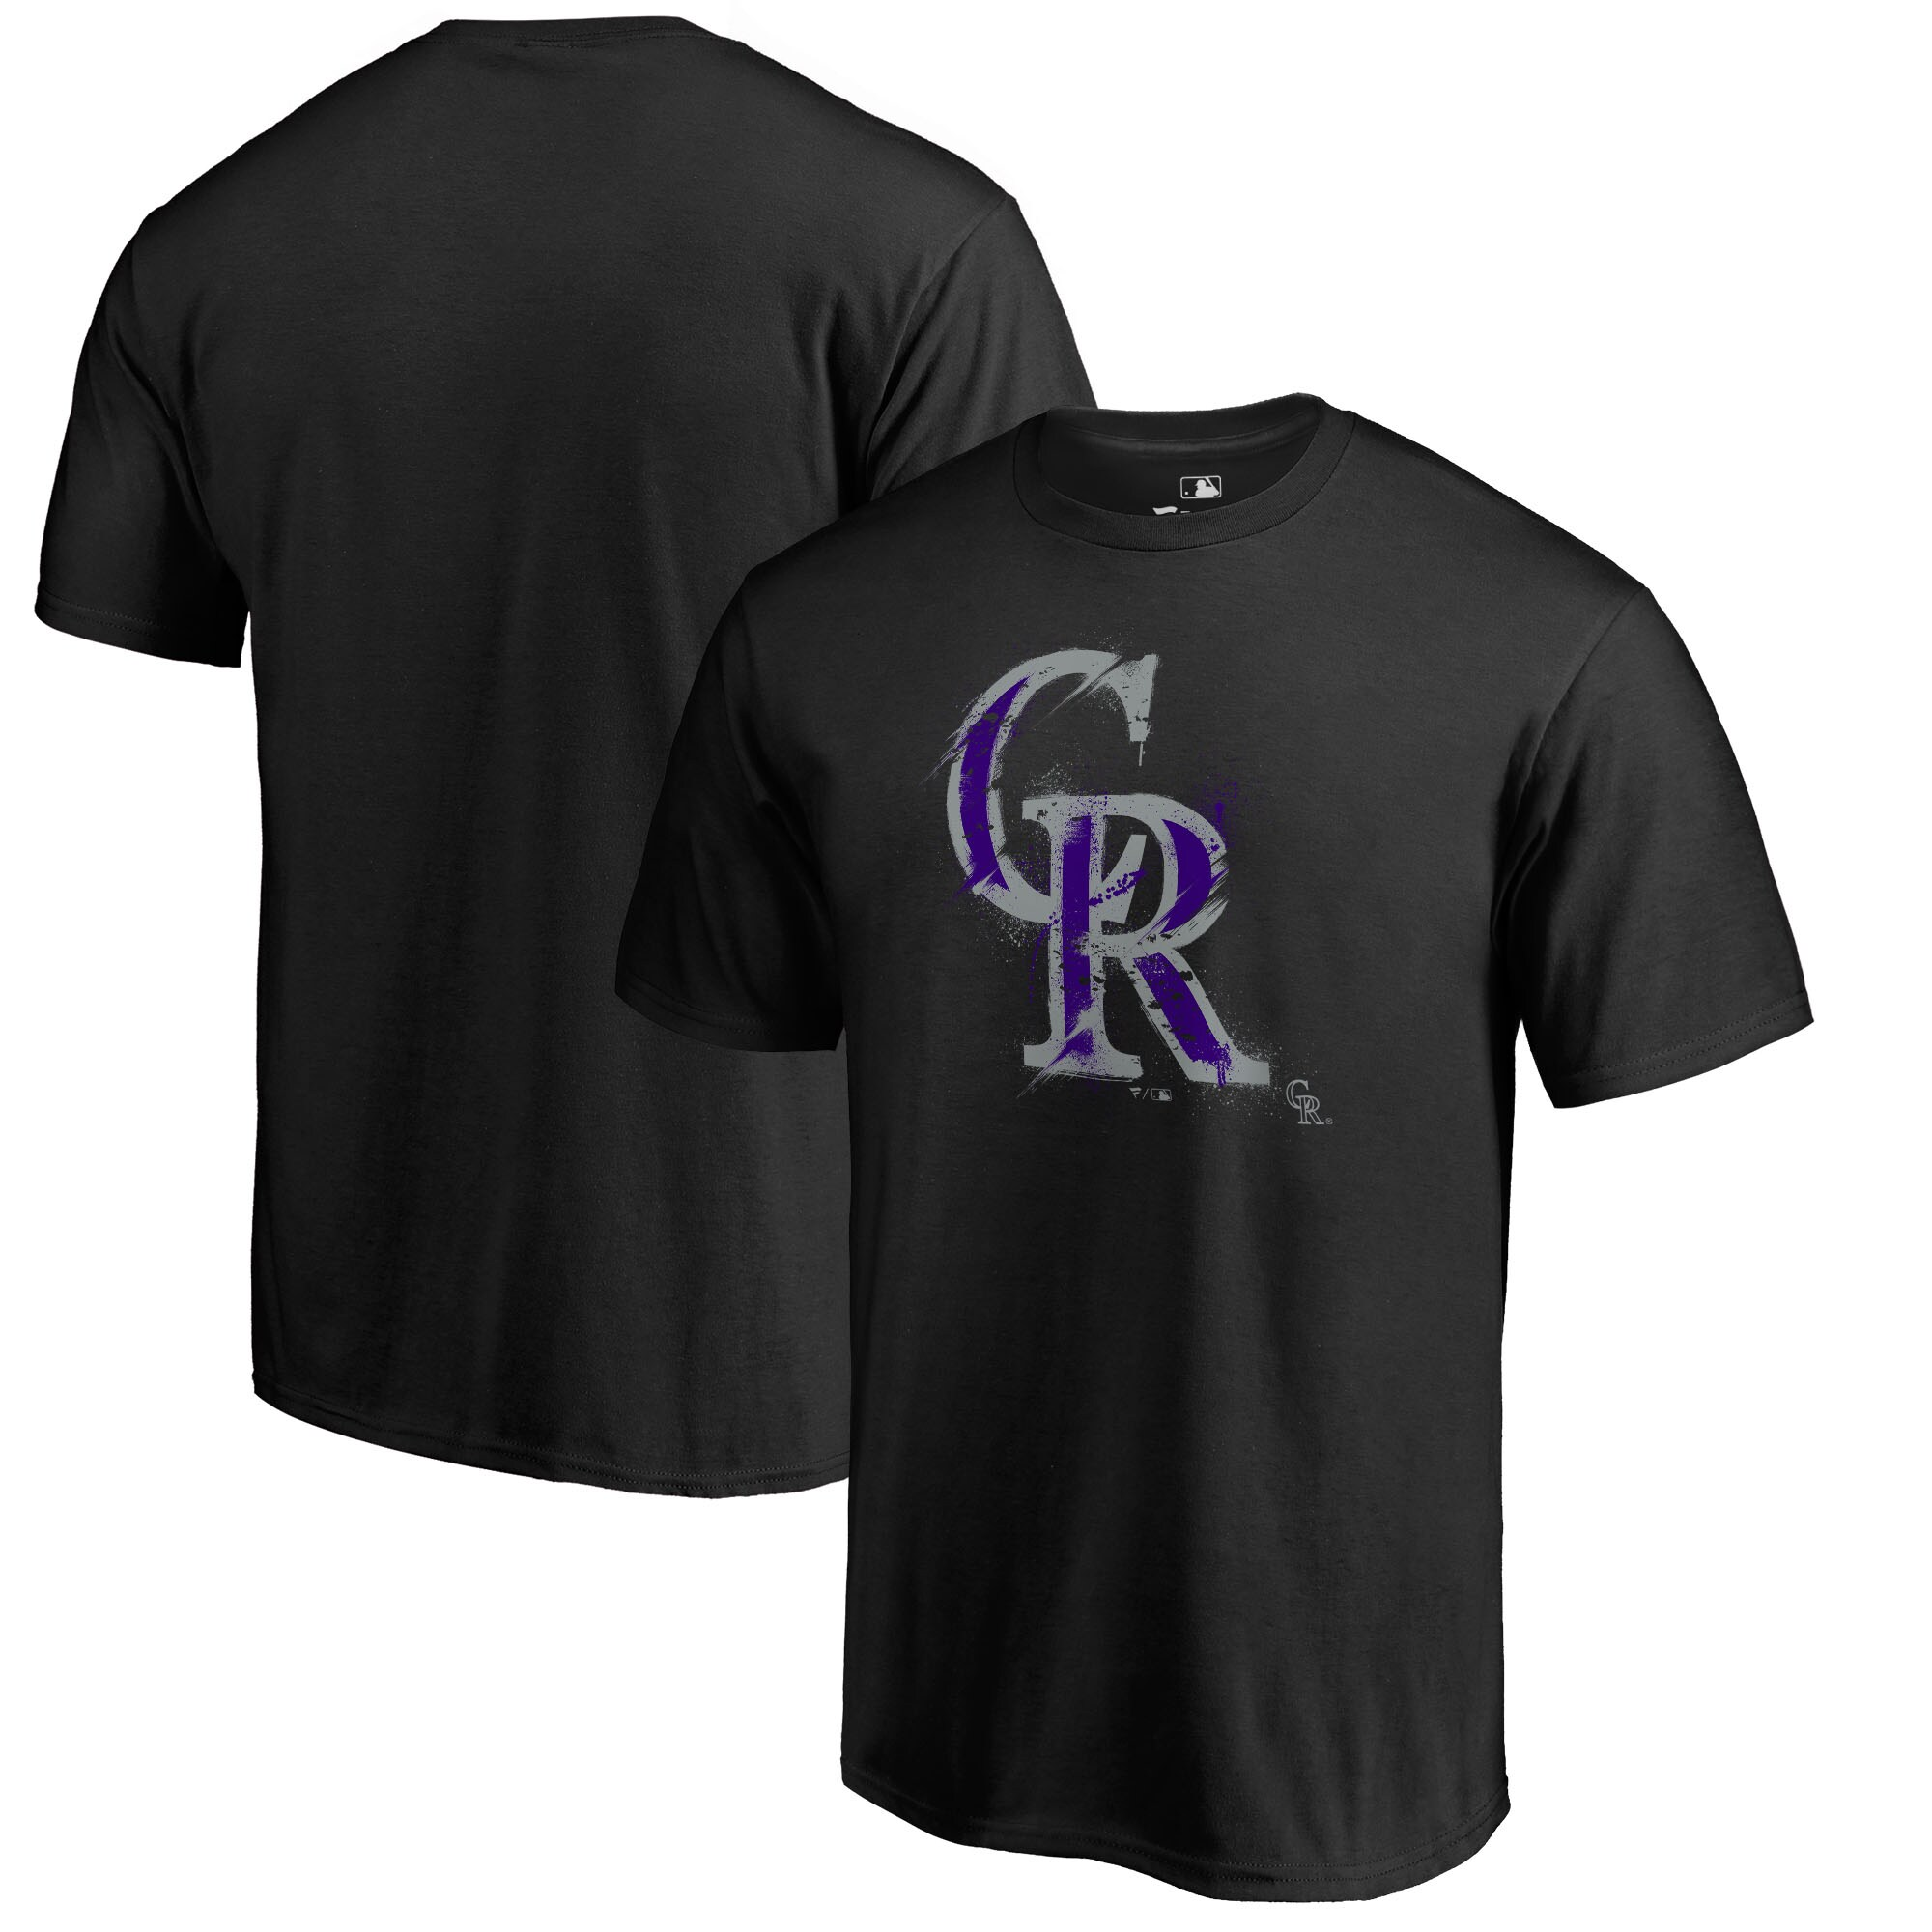 Colorado Rockies Fanatics Branded Splatter Logo Big and Tall T-Shirt - Black